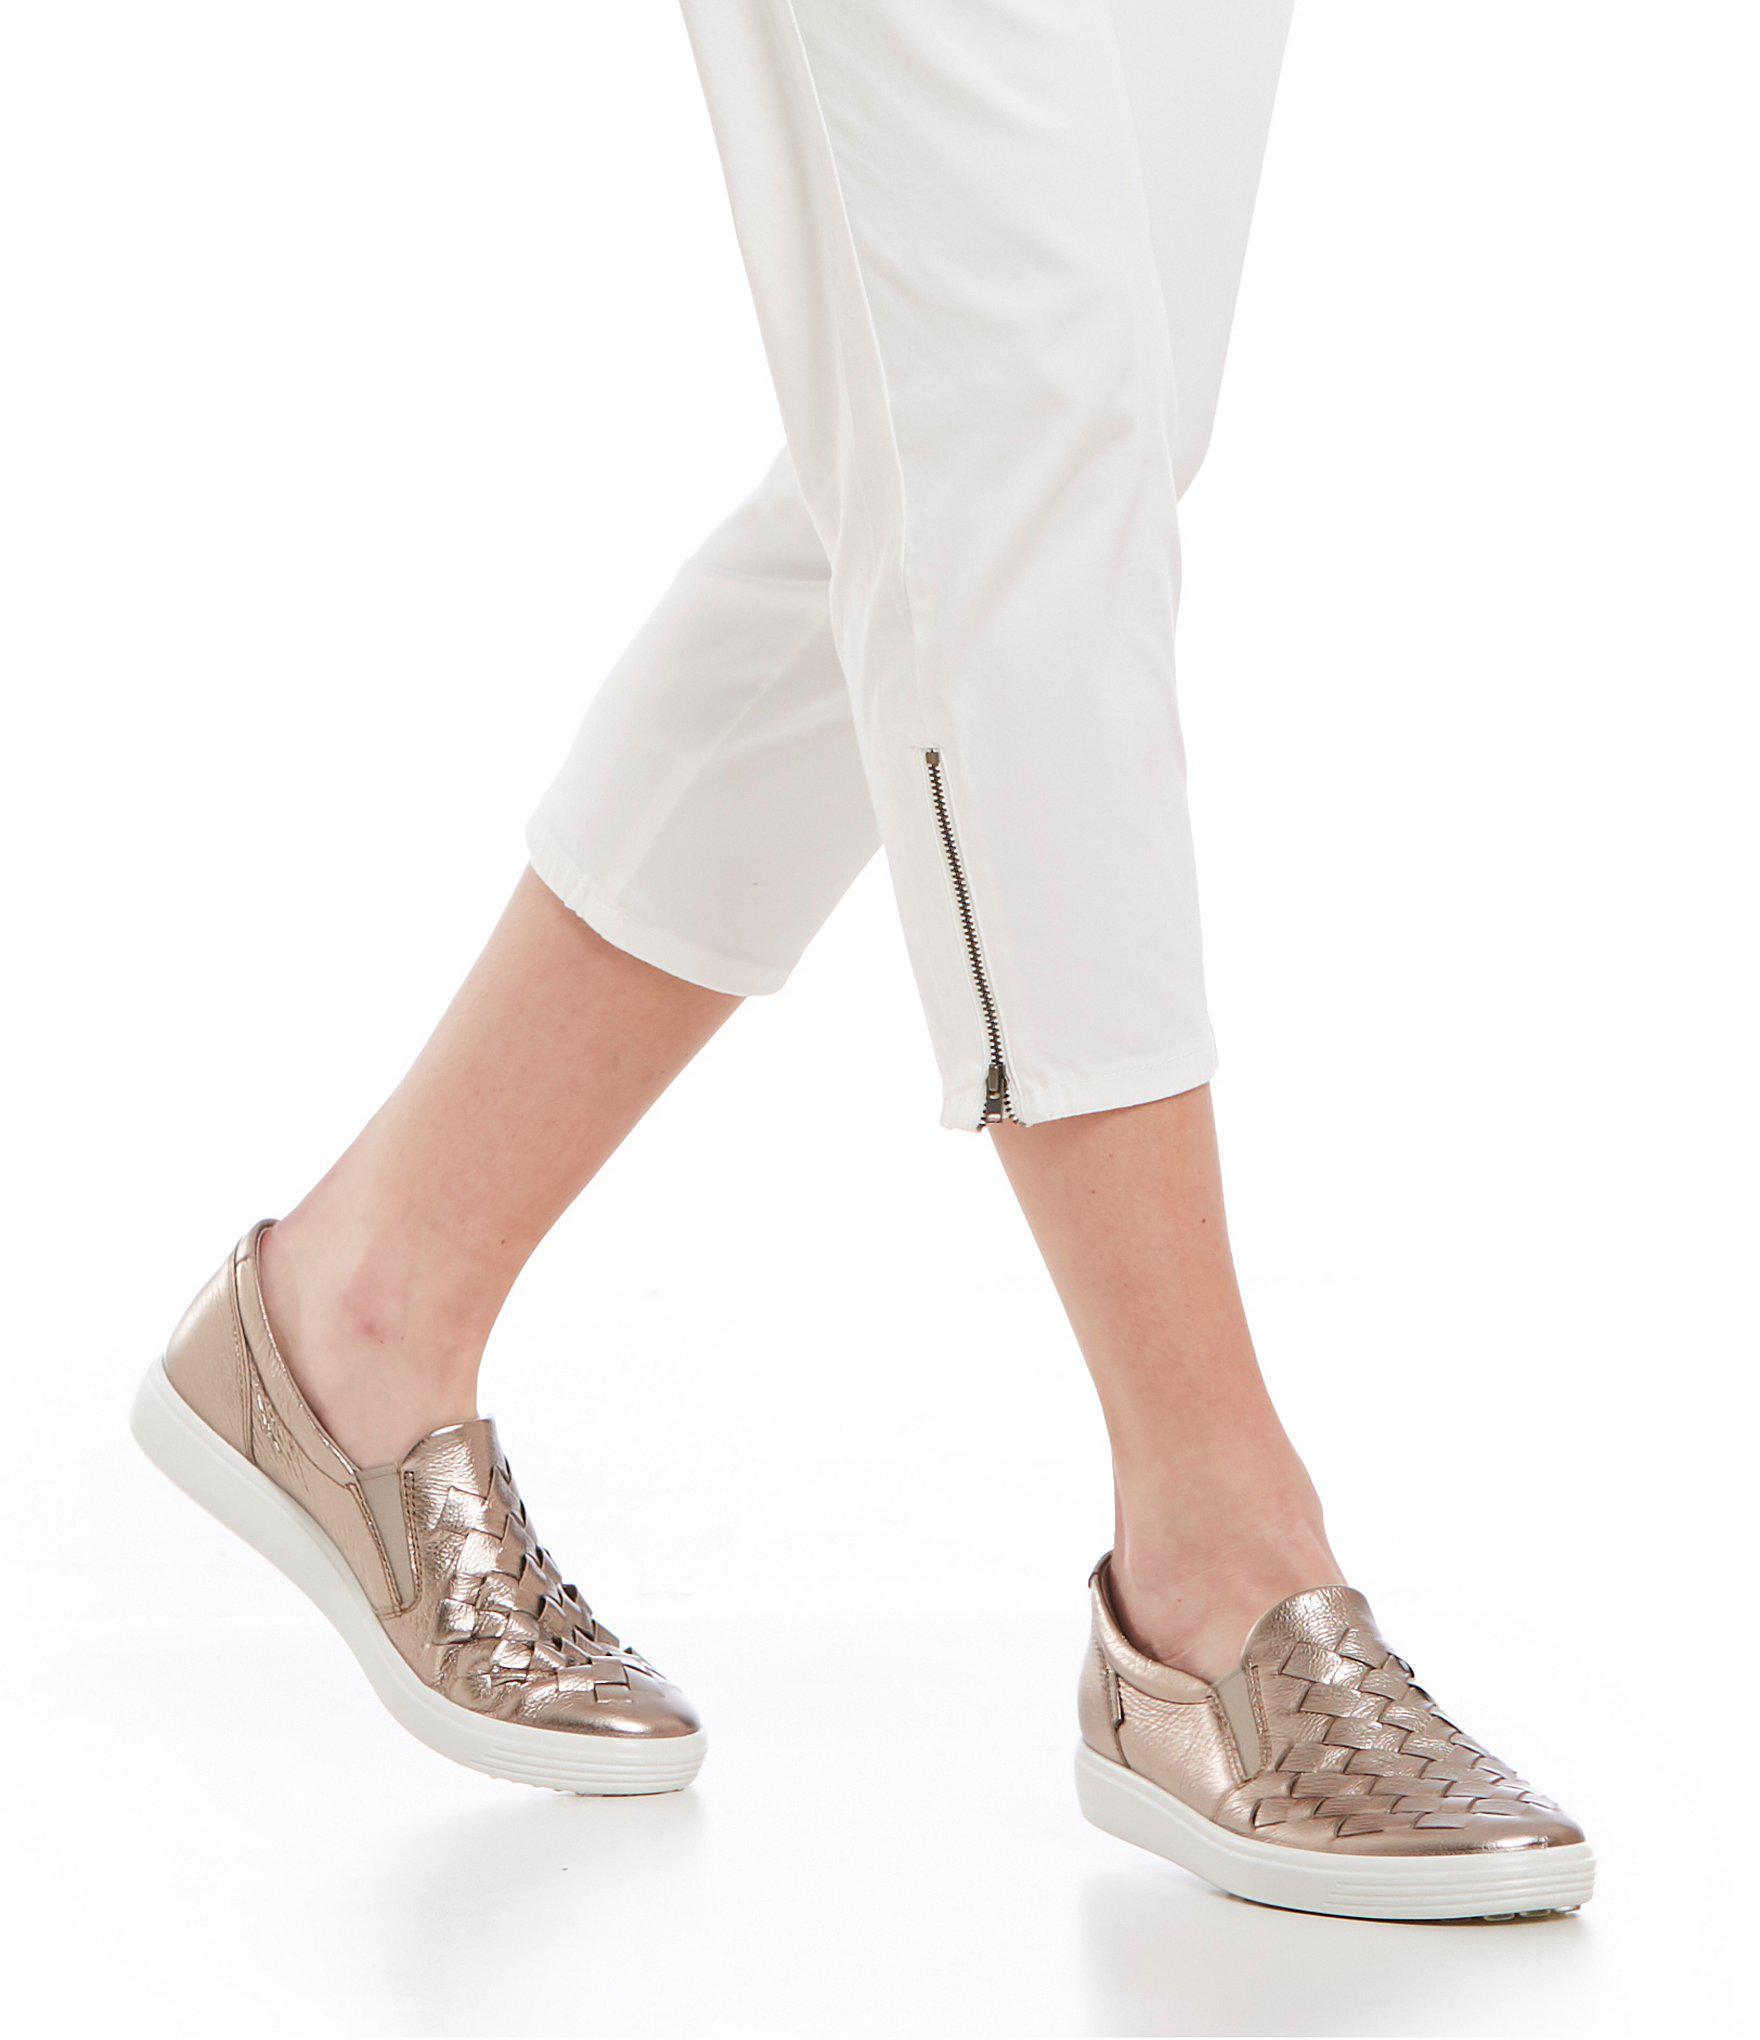 0fee2b1bf7da Ecco - Black Women s Soft 7 Woven Slip-on Sneakers - Lyst. View fullscreen